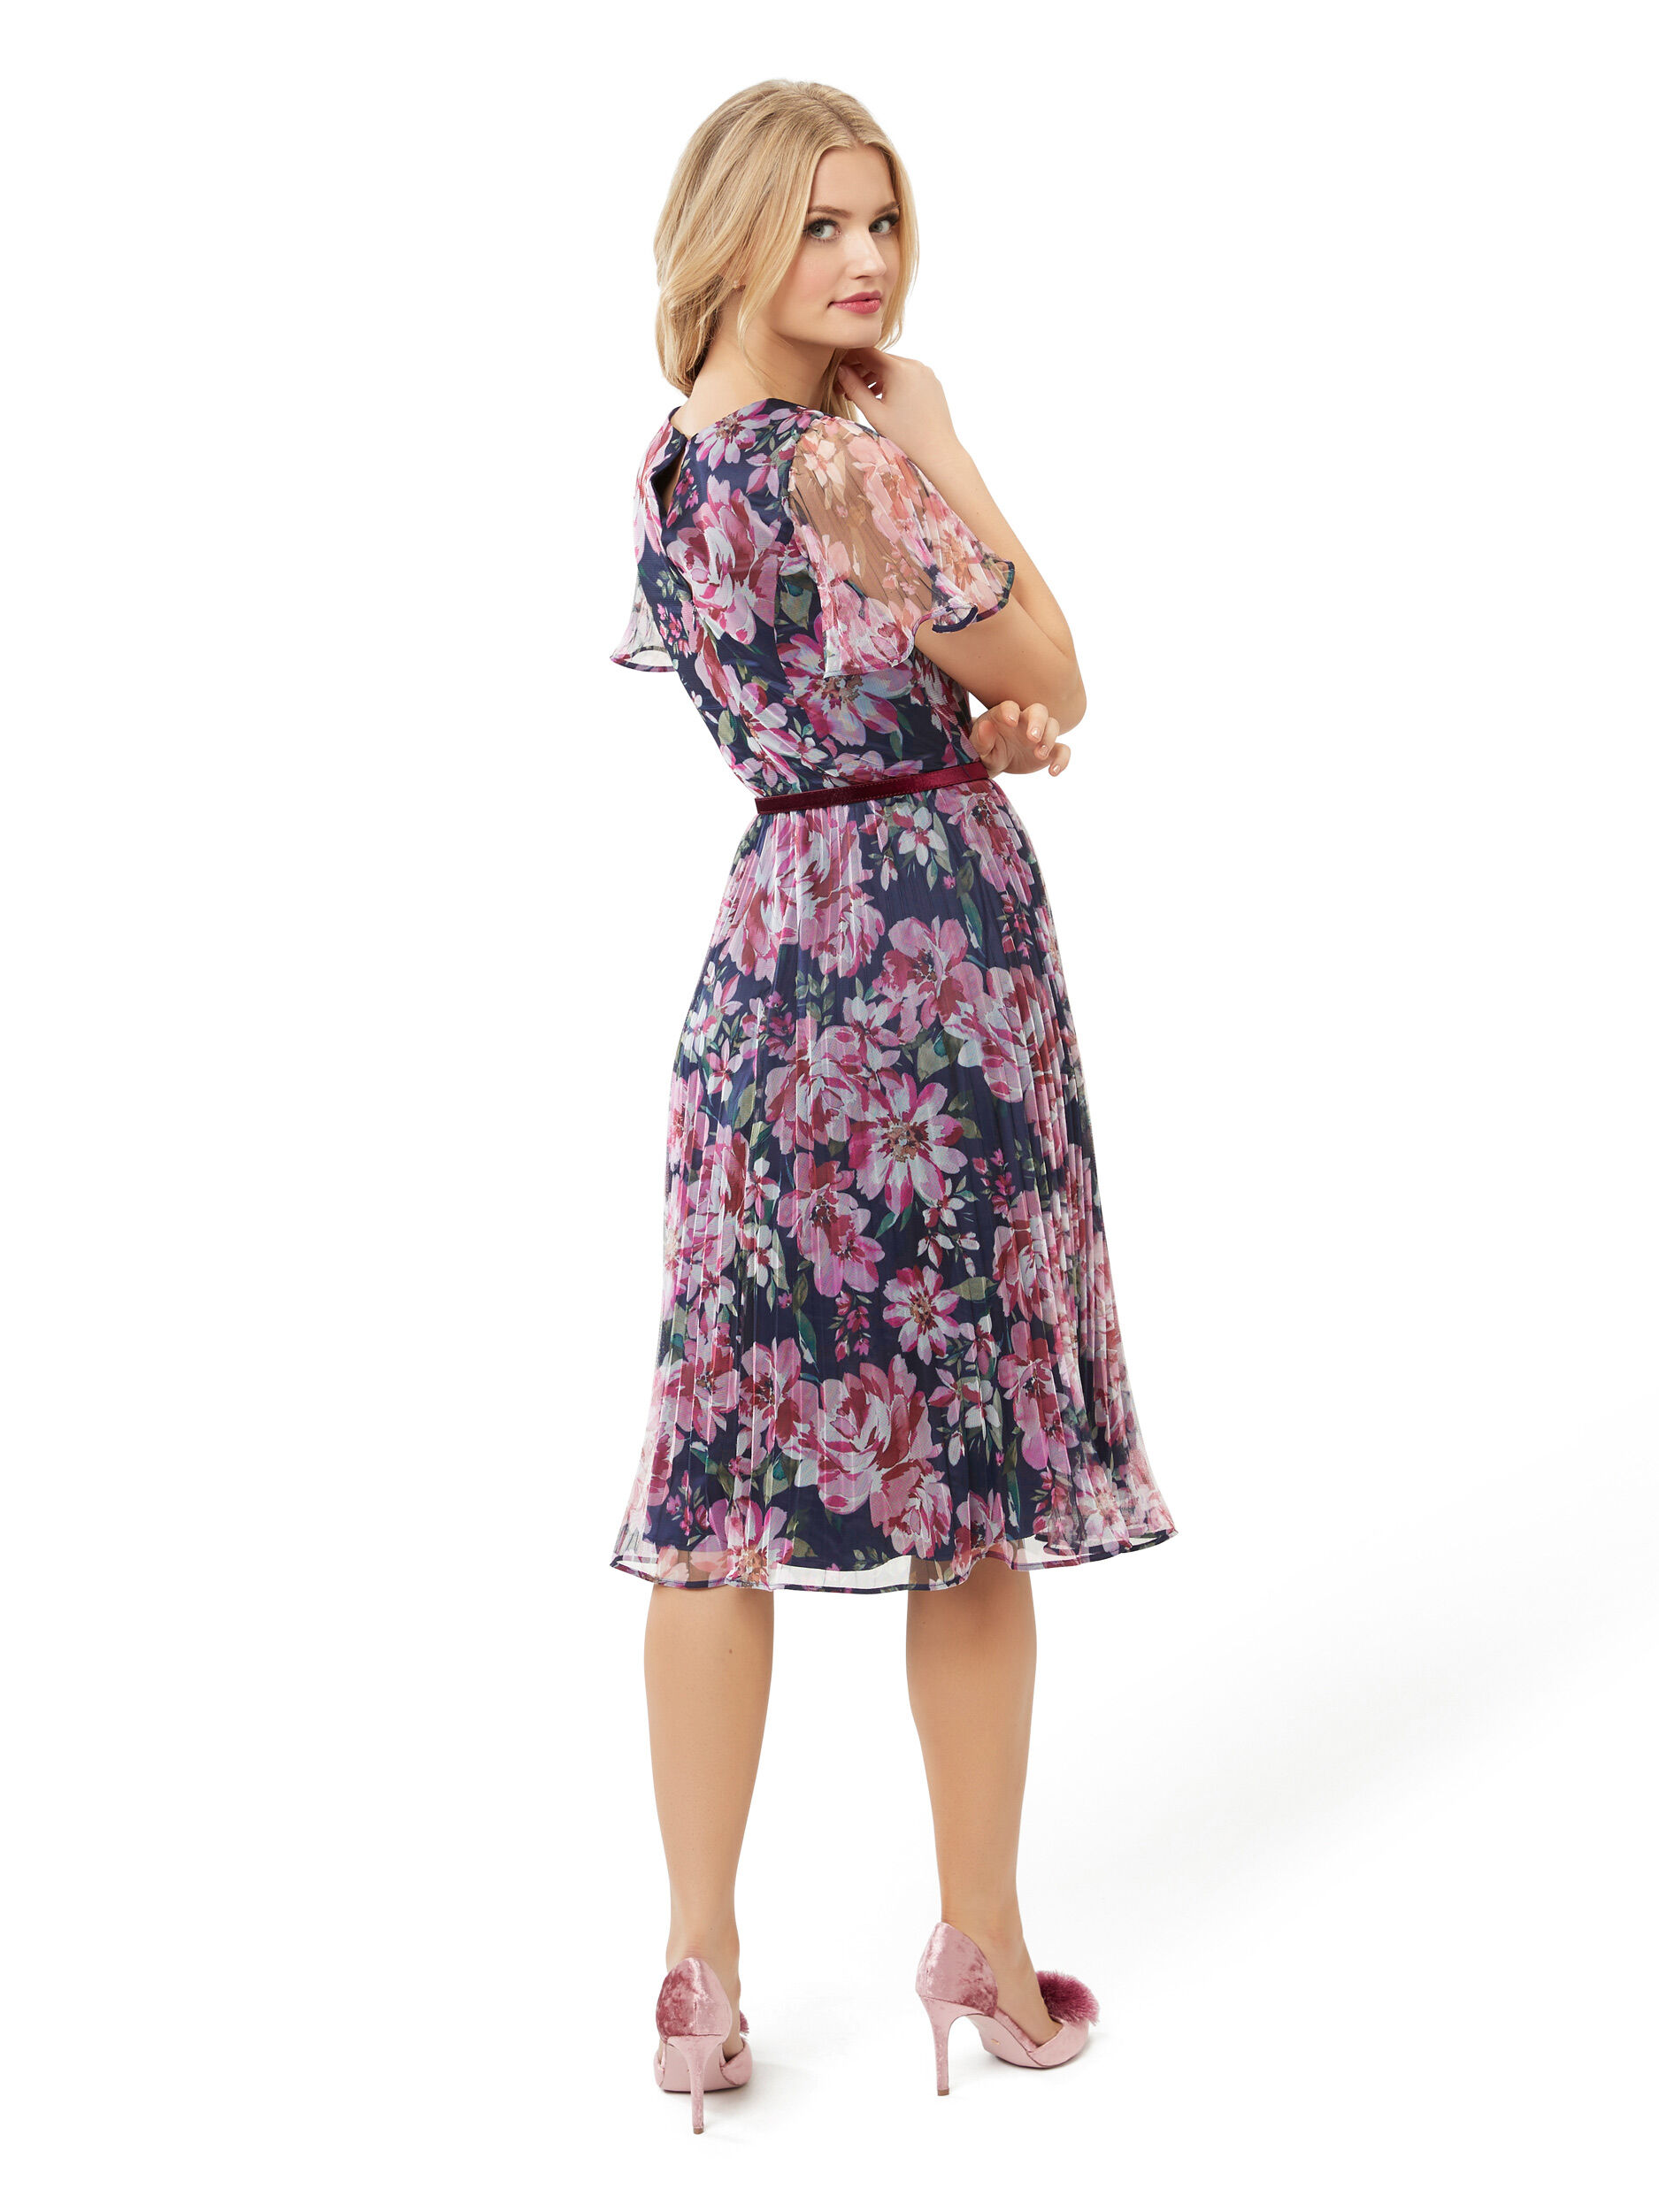 Oh Kate Dress